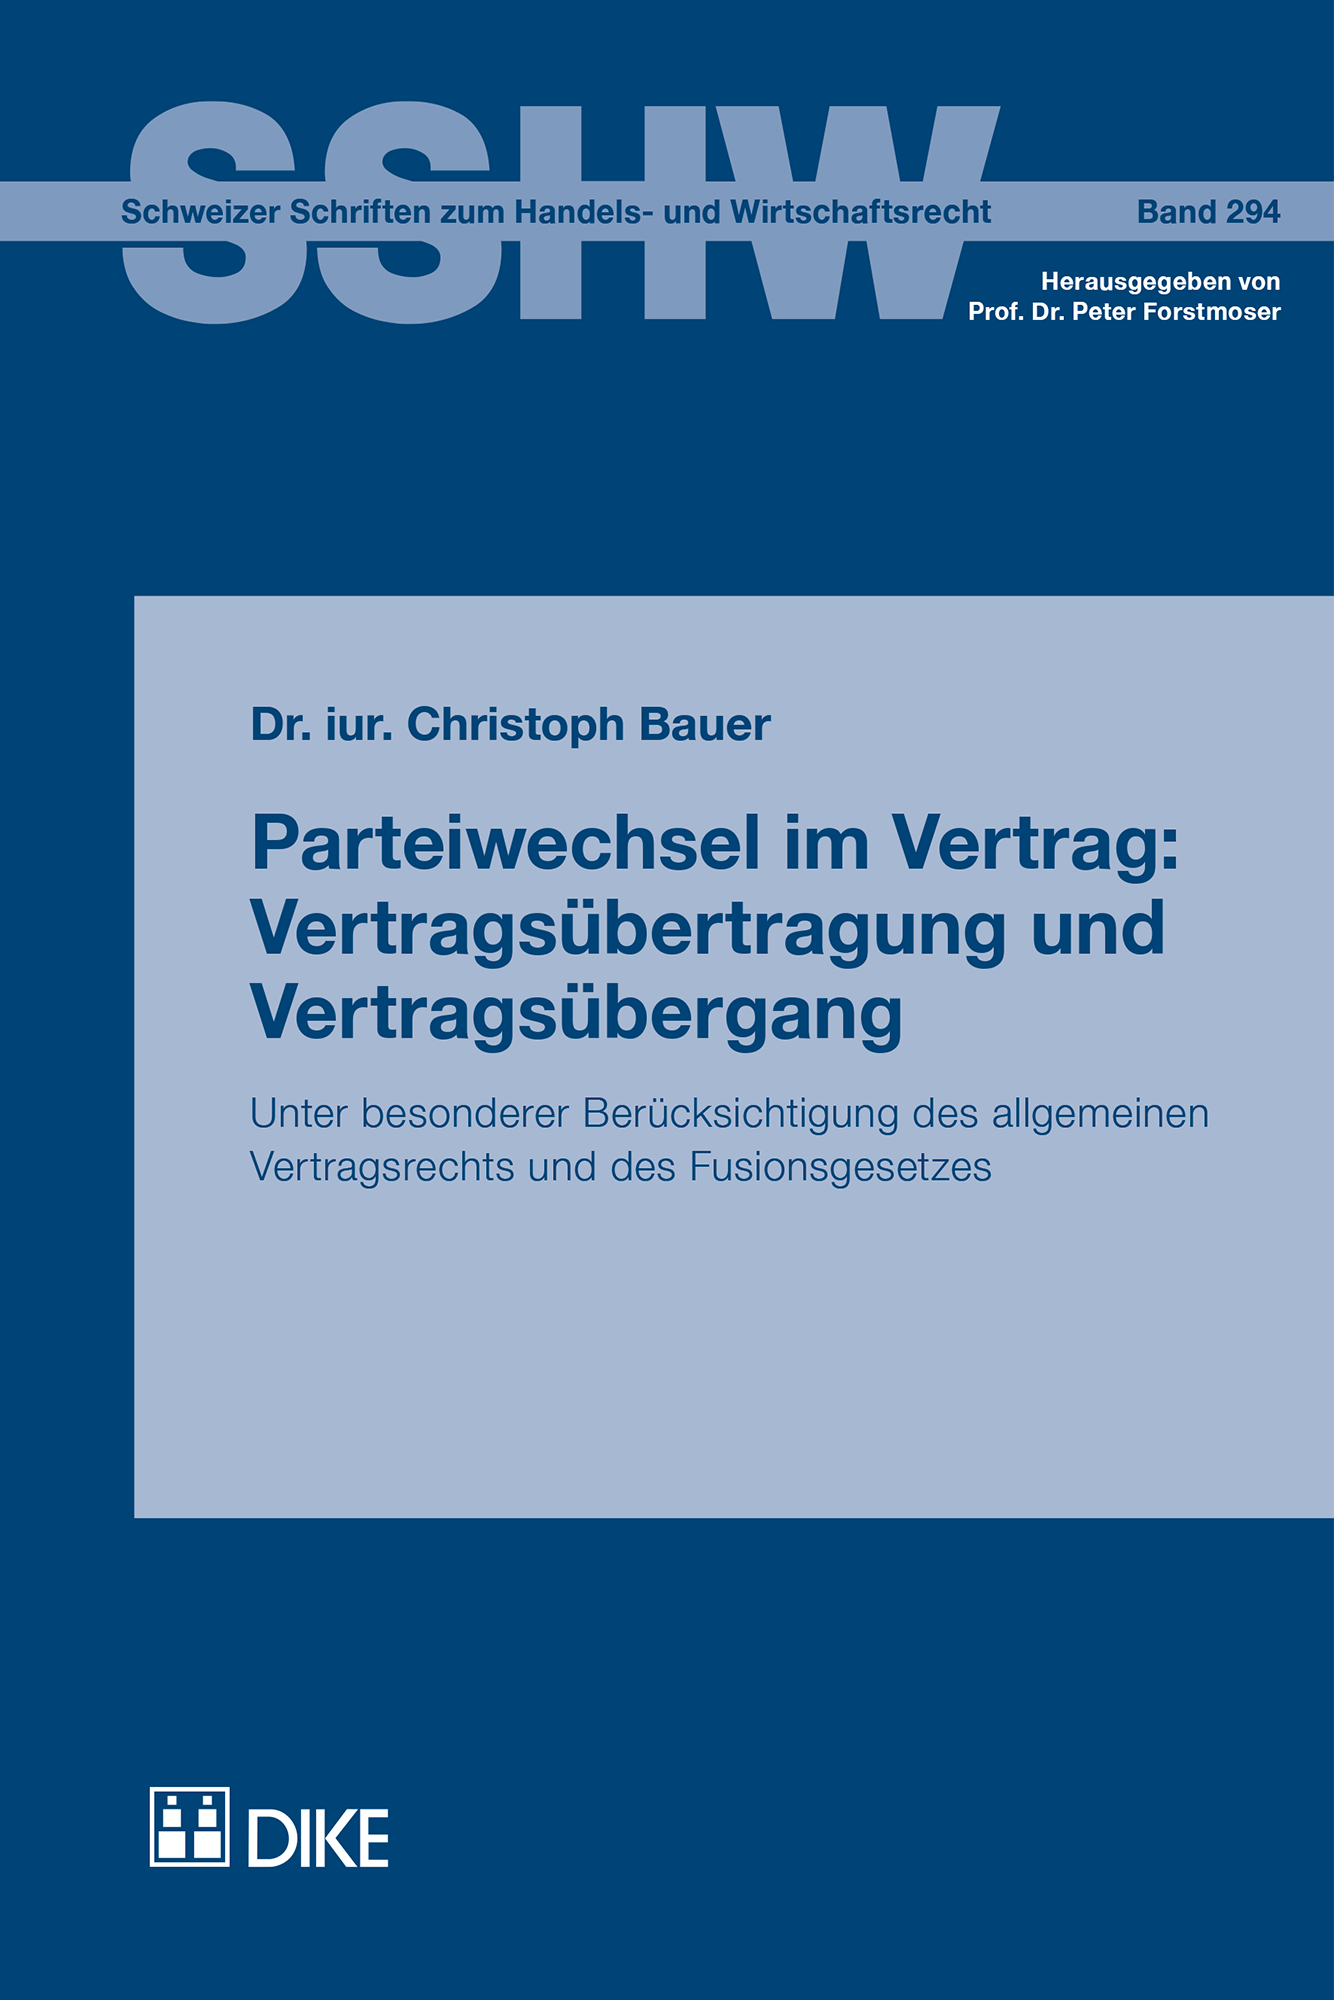 Parteiwechsel im Vertrag: Vertragsübertragung und Vertragsübergang